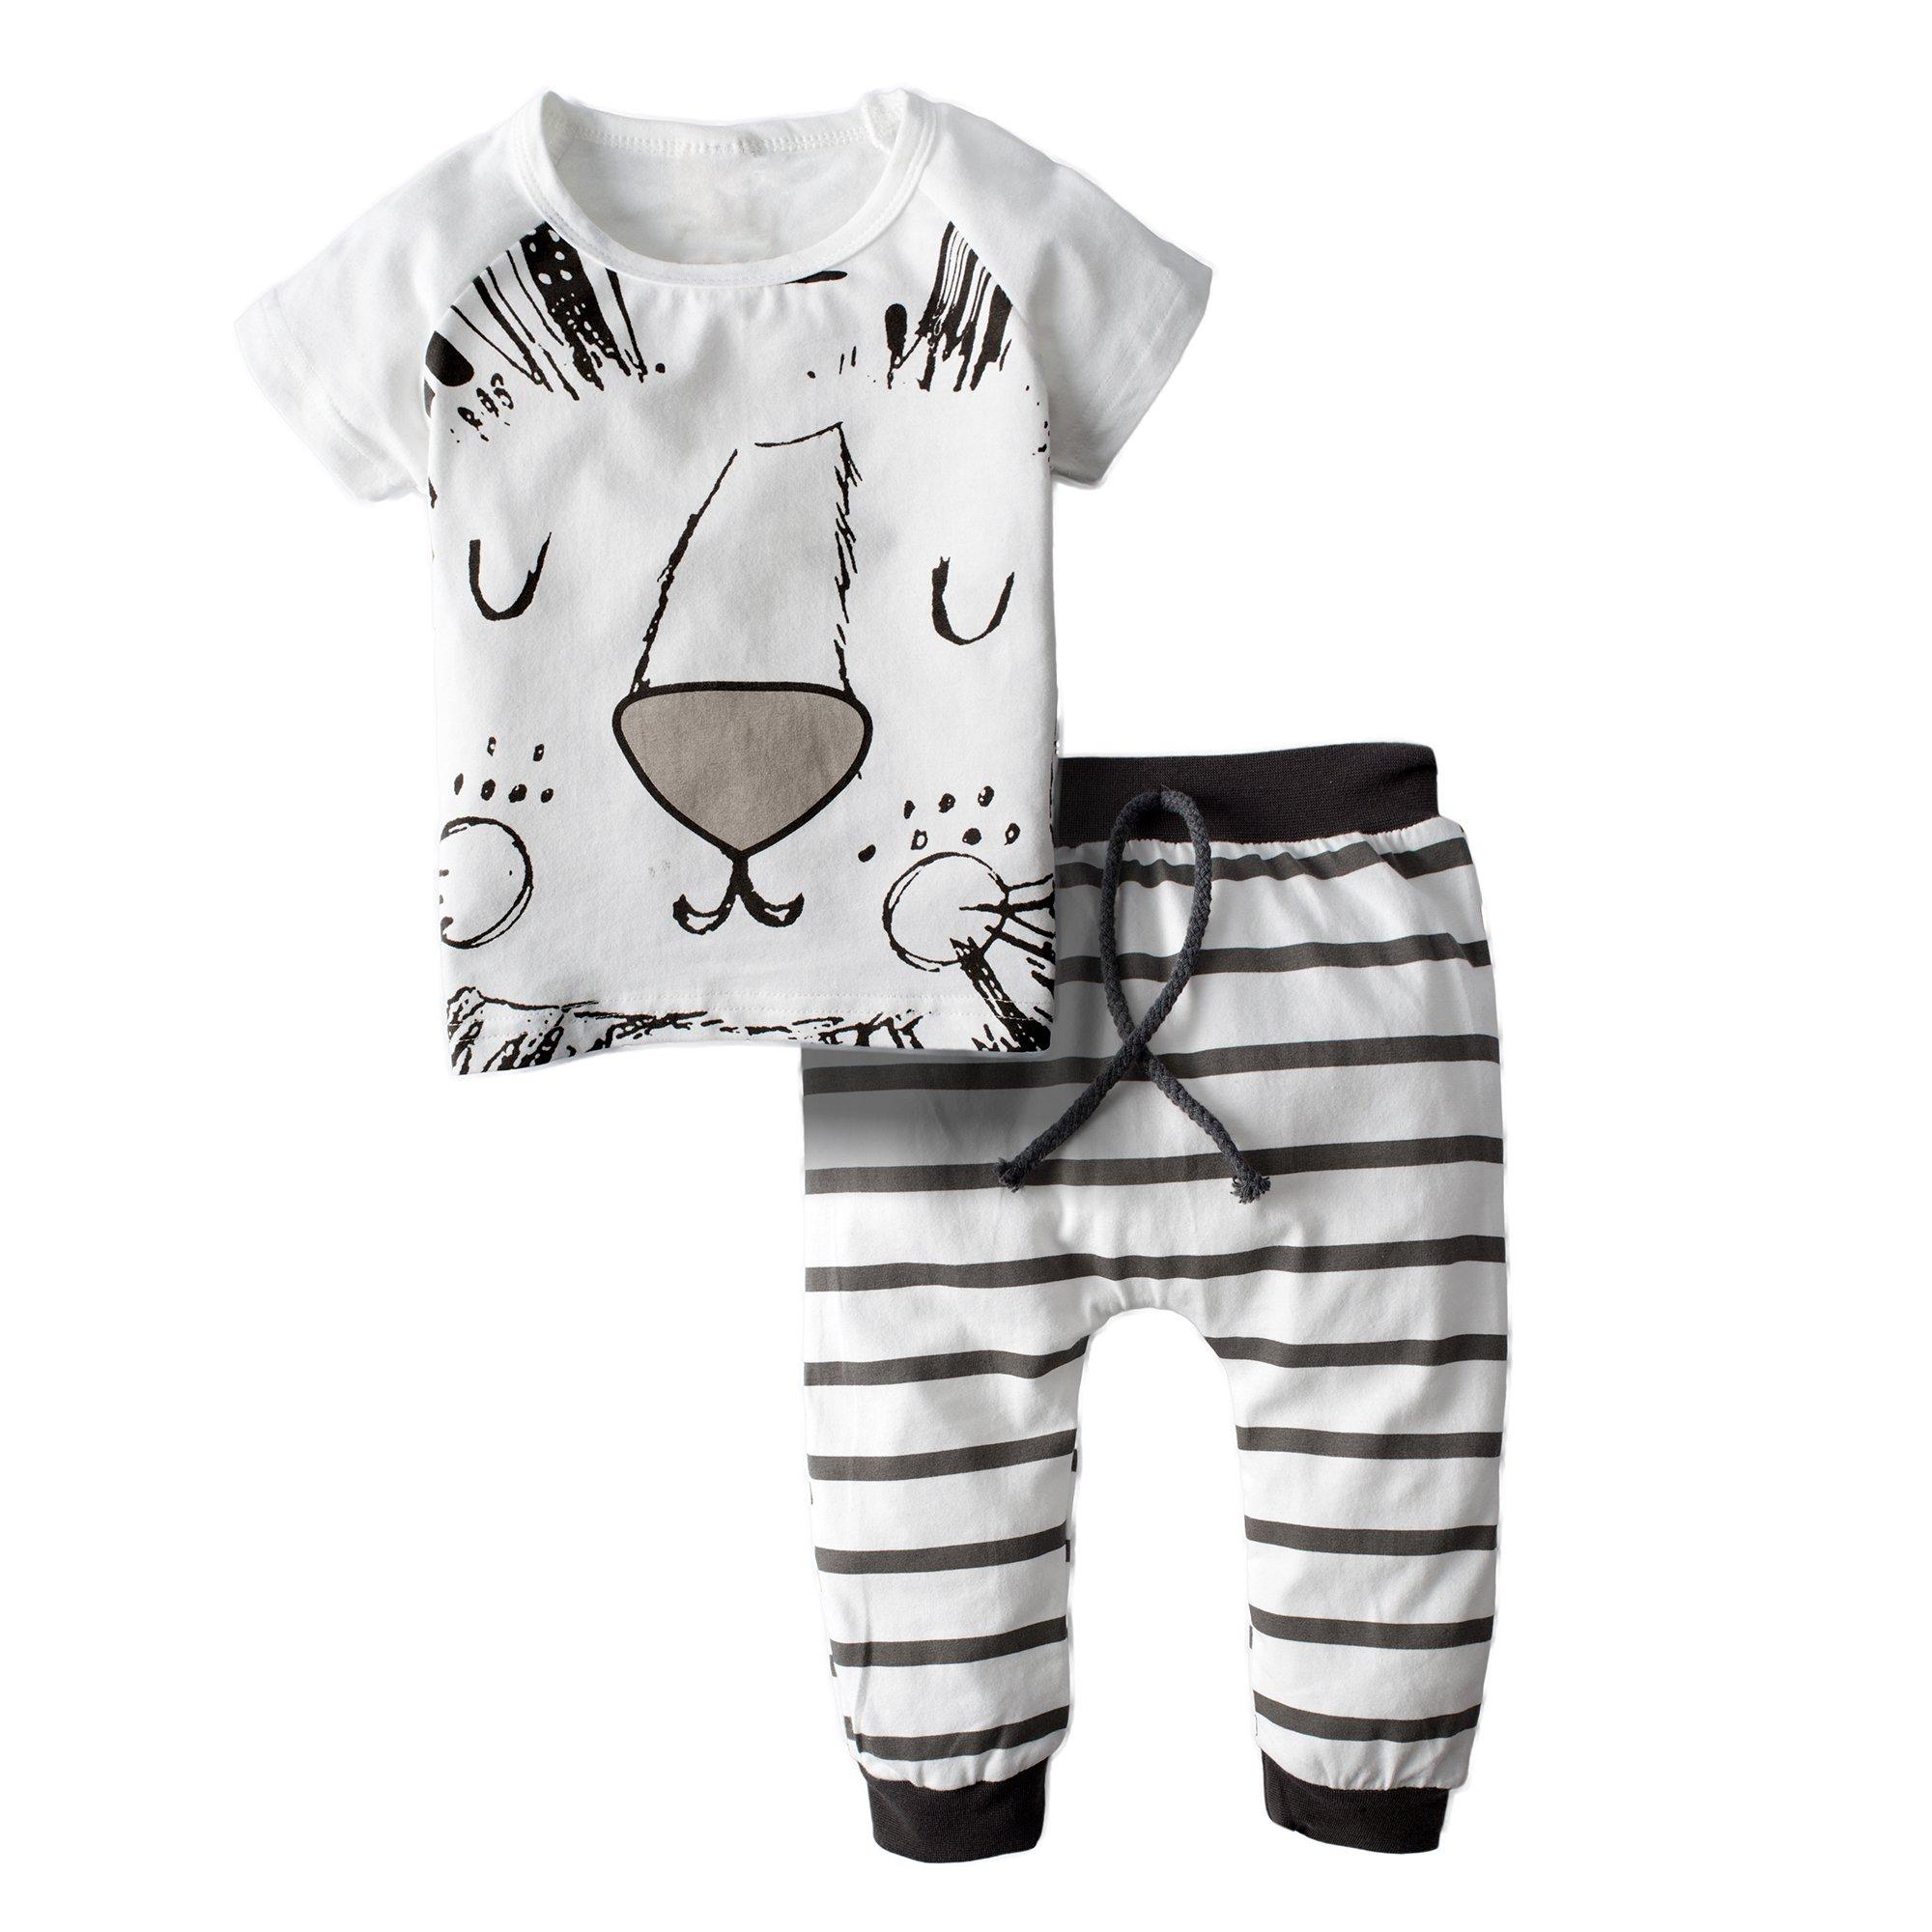 BIG ELEPHANT Baby Boys 2 Piece Cute Lion Short Sleeve Pants Clothing Set H79-70(3-6 Months